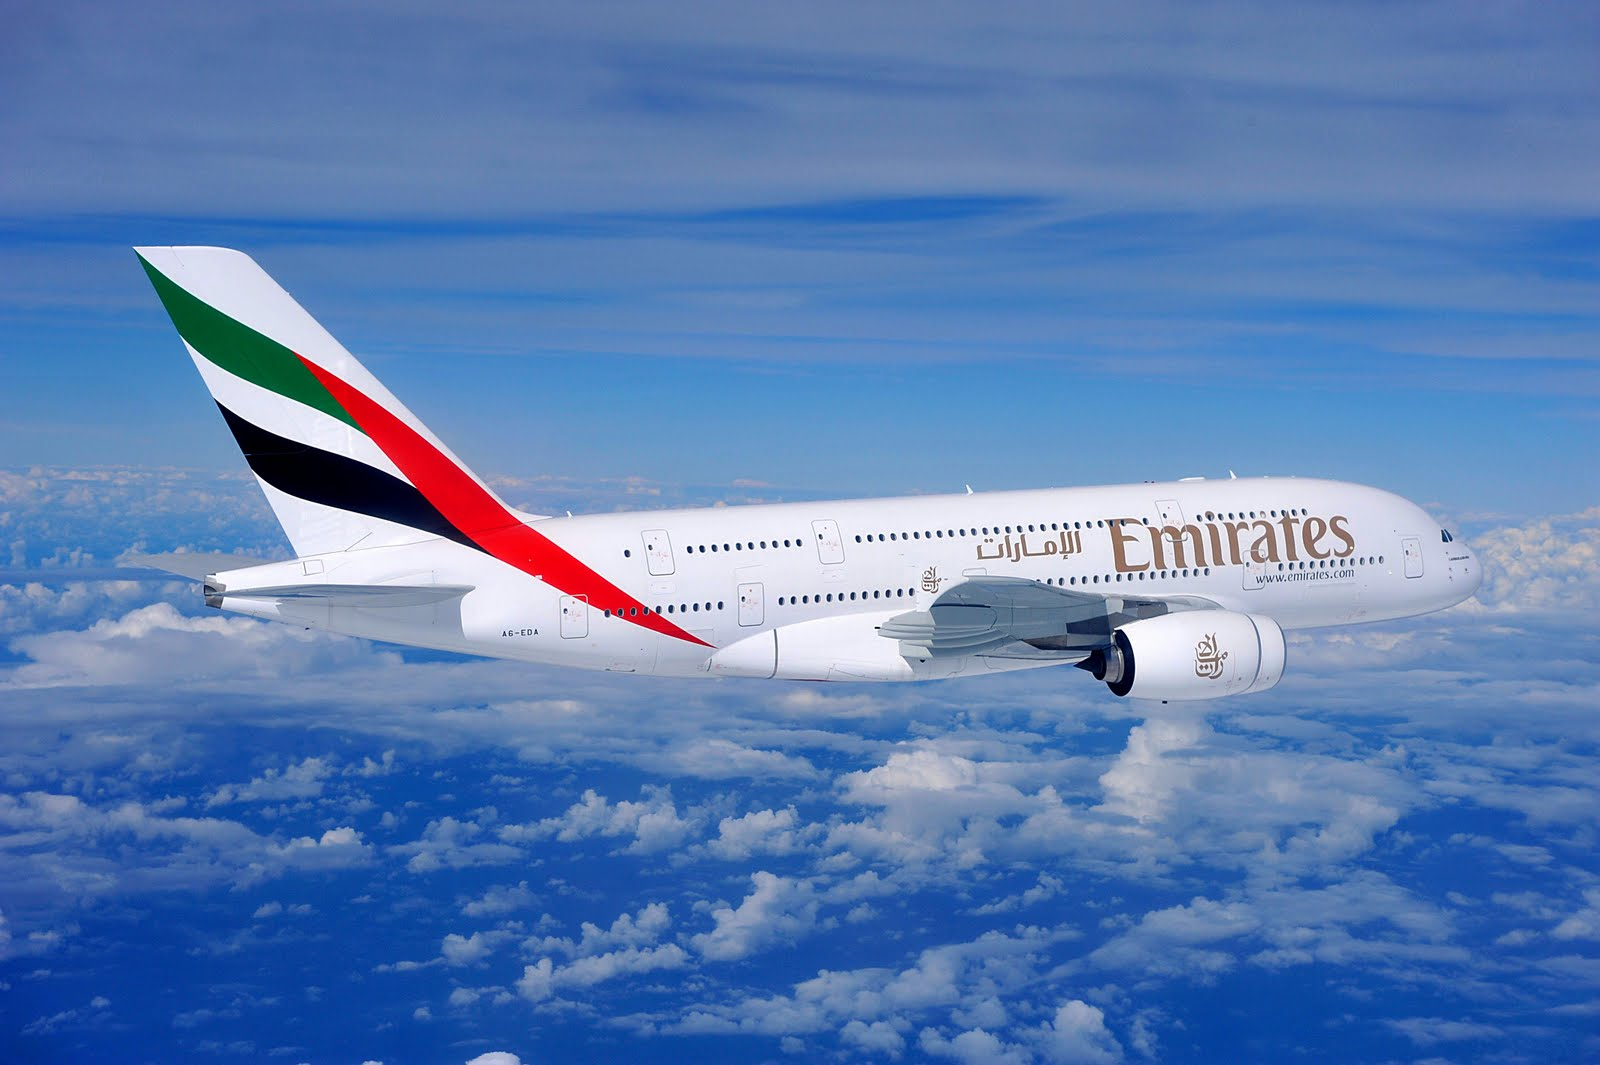 Emirates Airline 阿聯酋航空公司簡介與航班機票優惠預訂